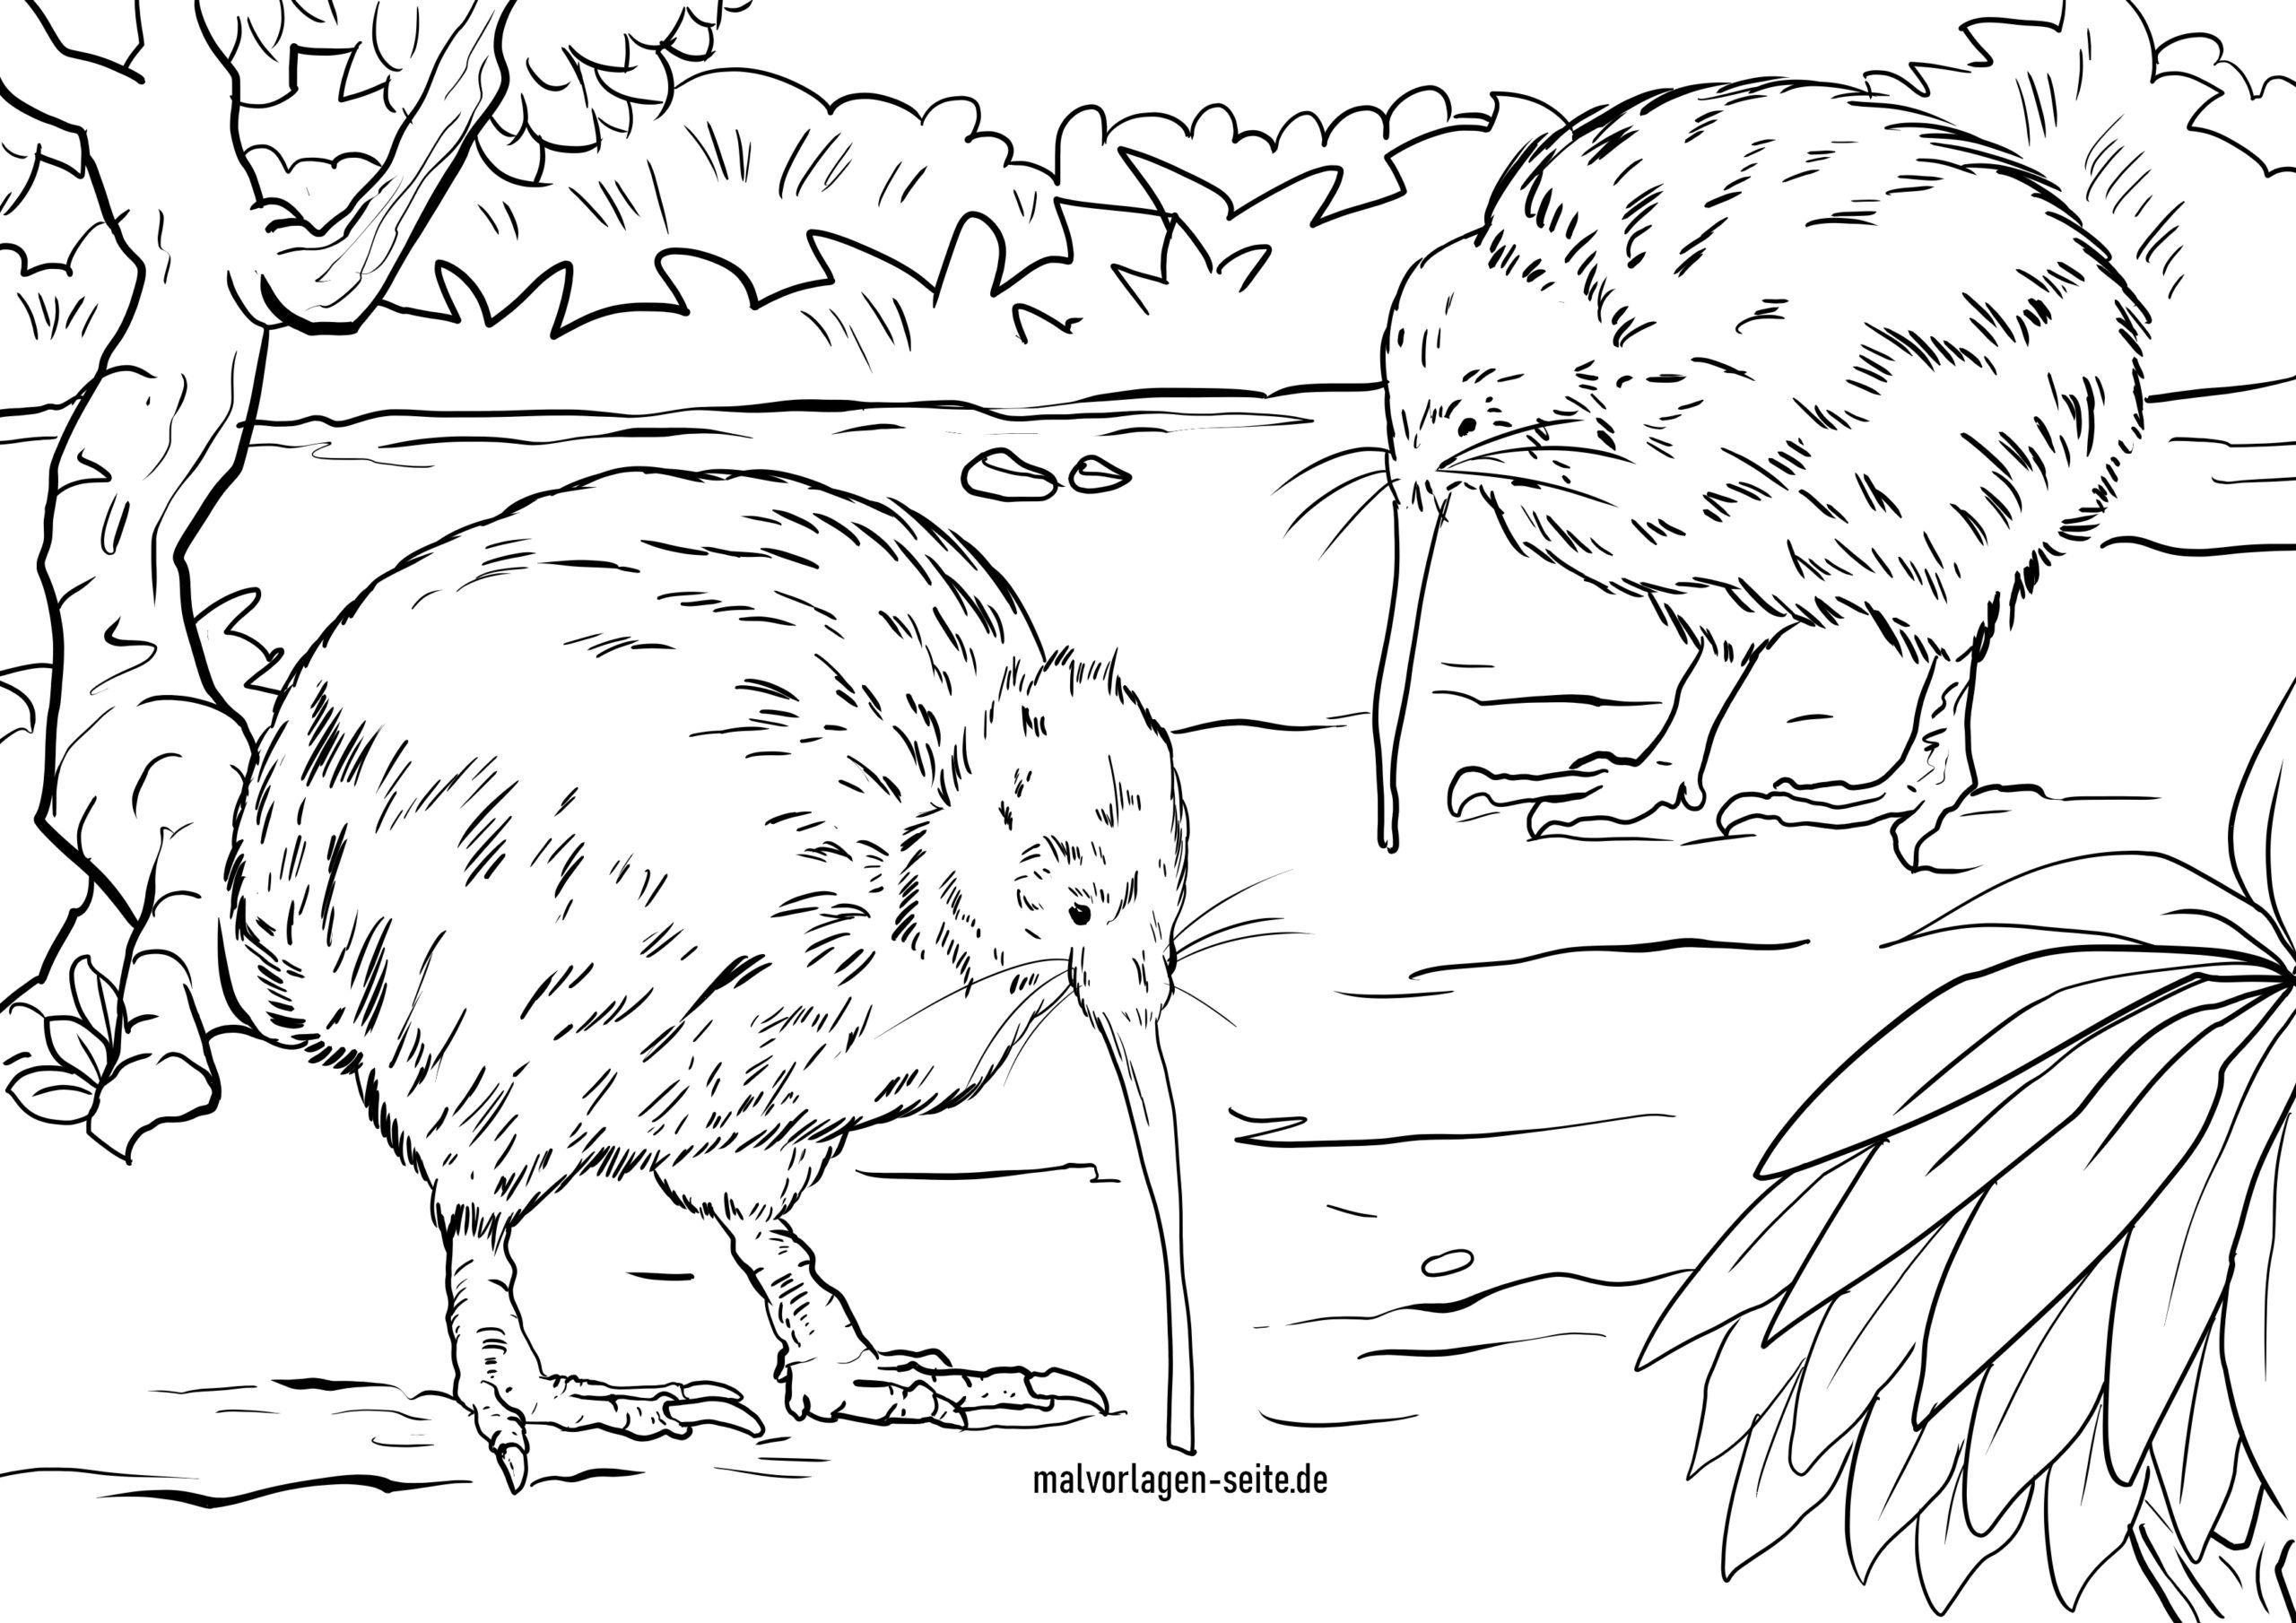 Malvorlage Kiwi  Vögel - Kostenlose Ausmalbilder